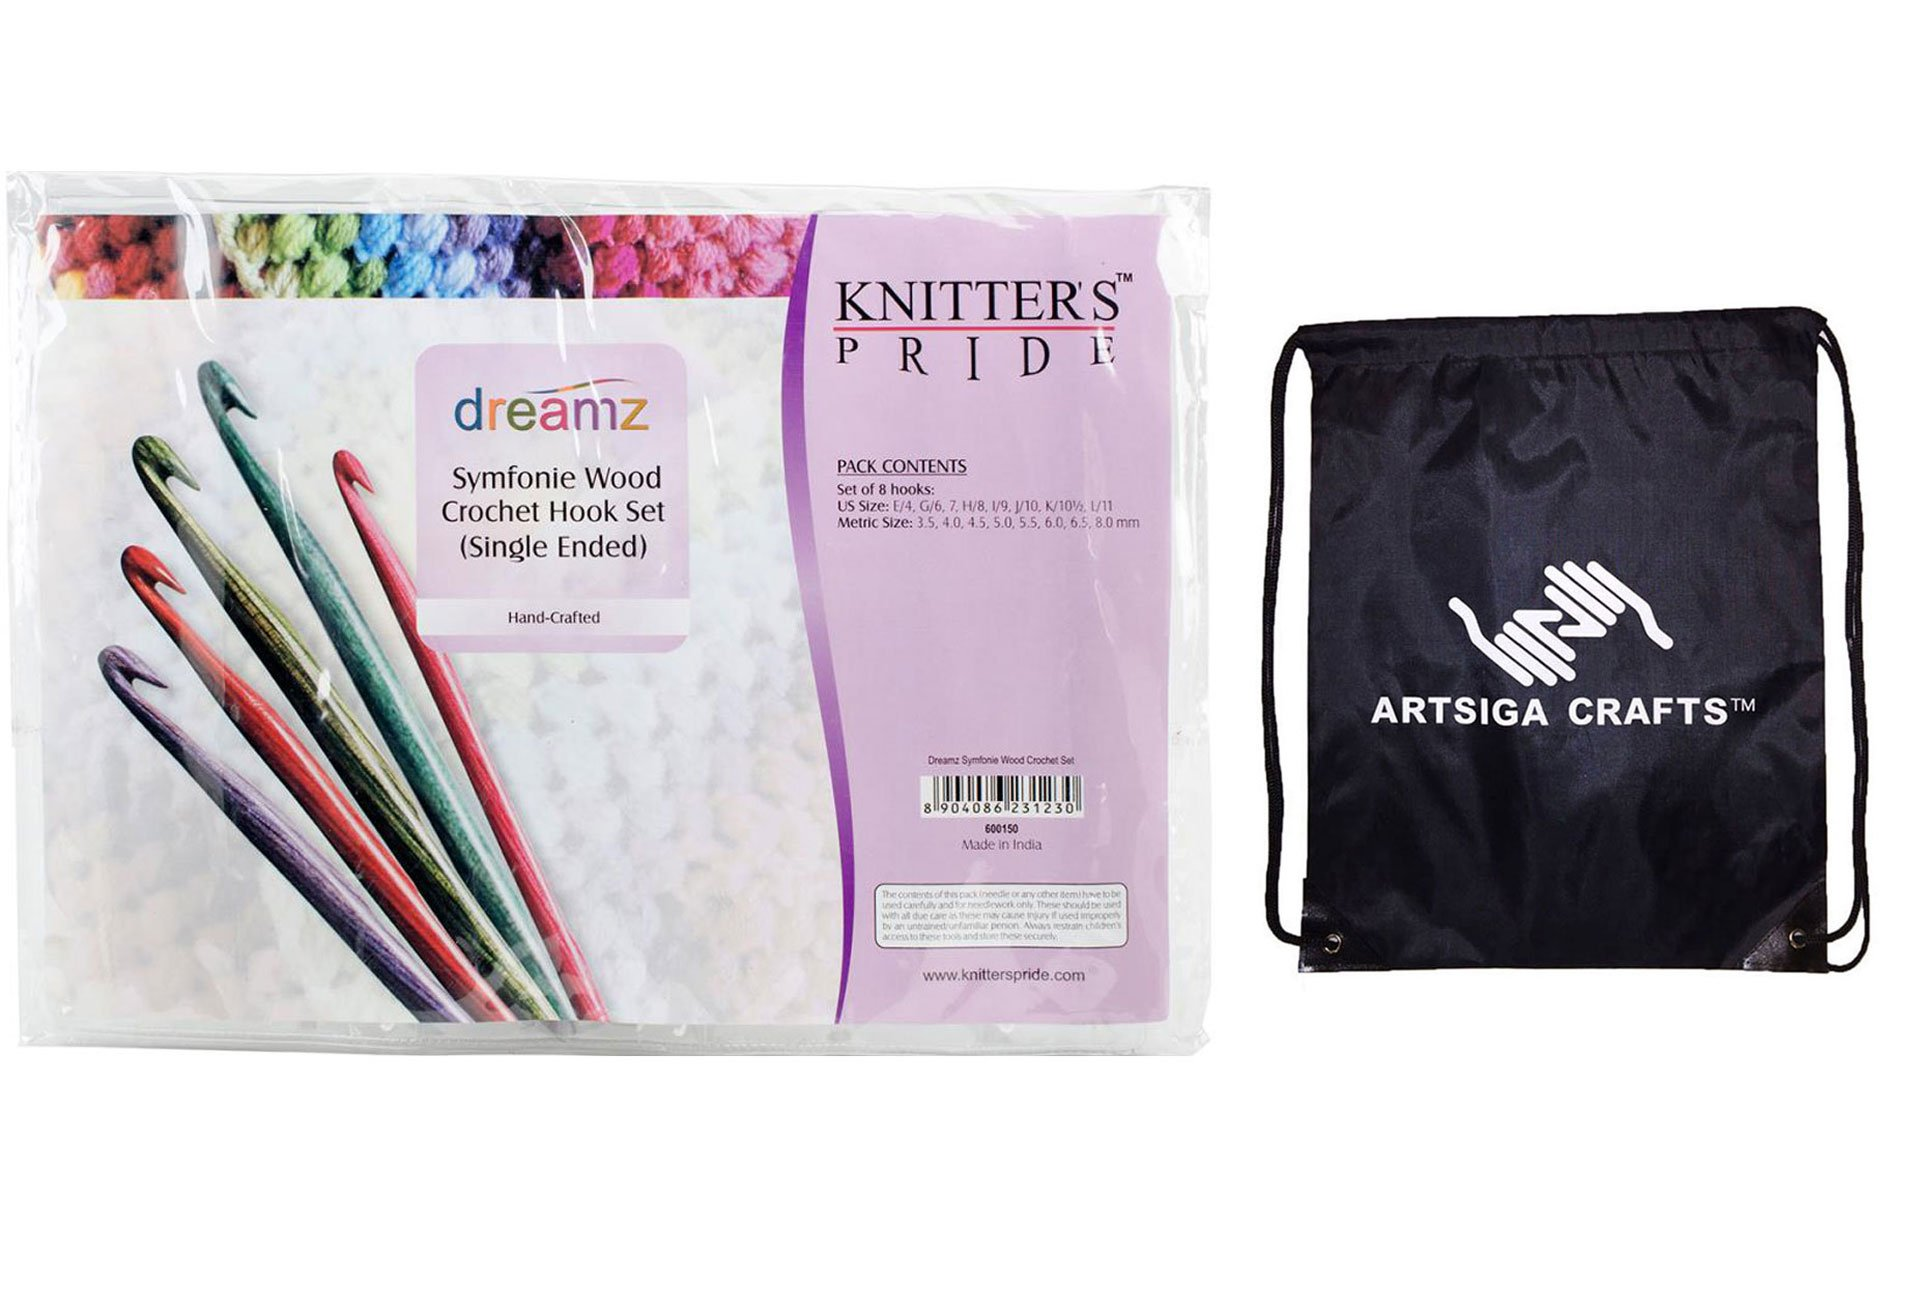 Knitter's Pride Knitting Needles Dreamz 6 inch (15cm) Single Ended Crochet Hook Set Bundle with 1 Artsiga Crafts Project Bag 600150